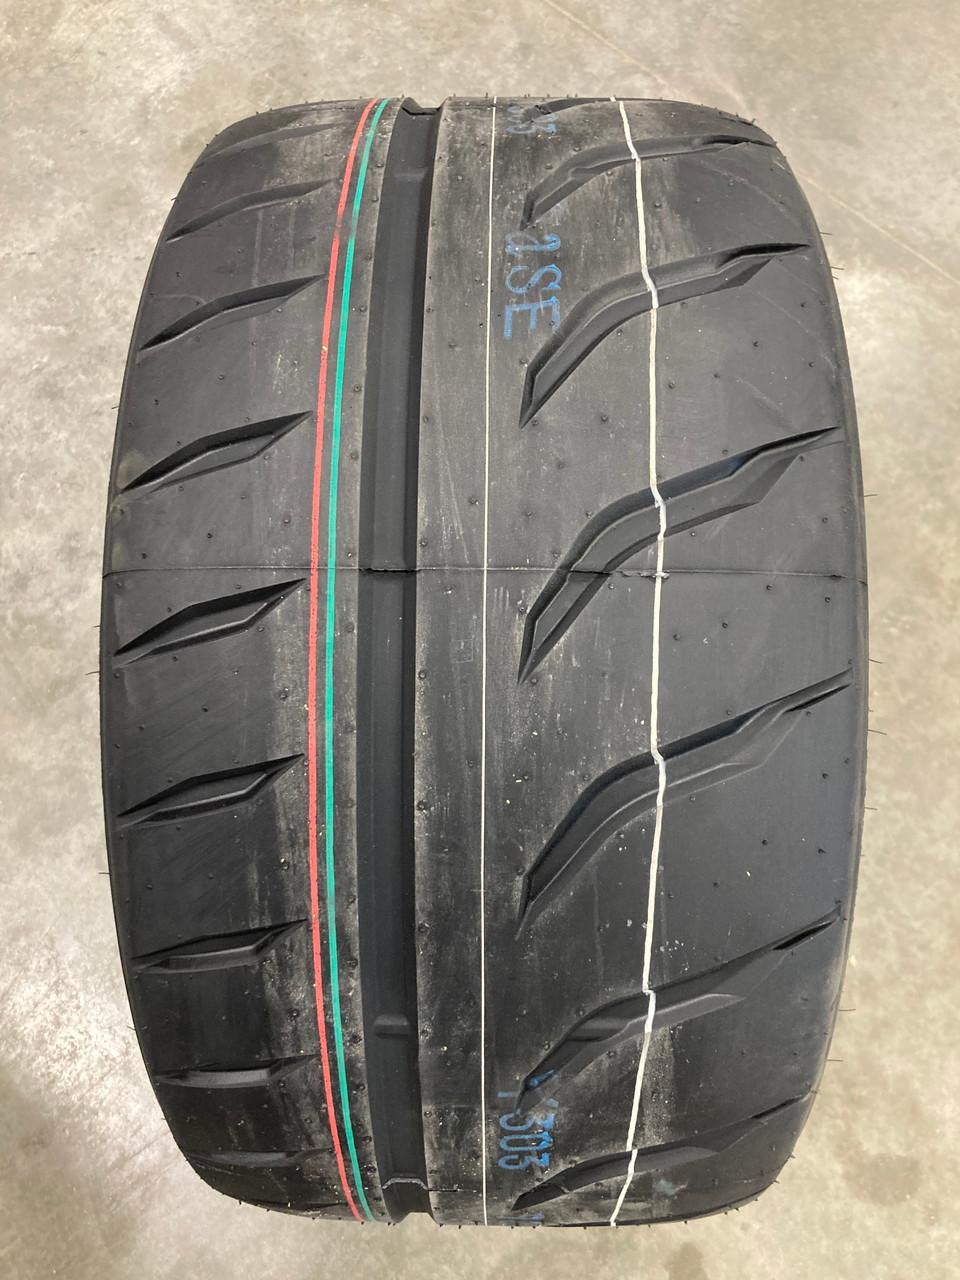 New Tire 275 35 18 Toyo Proxes R888R BSW 95Y 275/35ZR18 Street RR